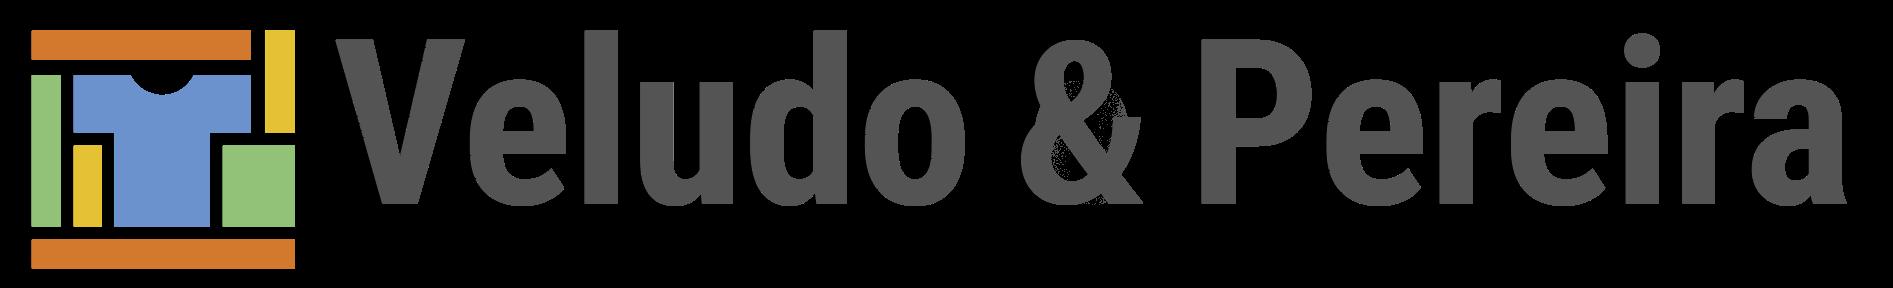 Veludo e Pereira